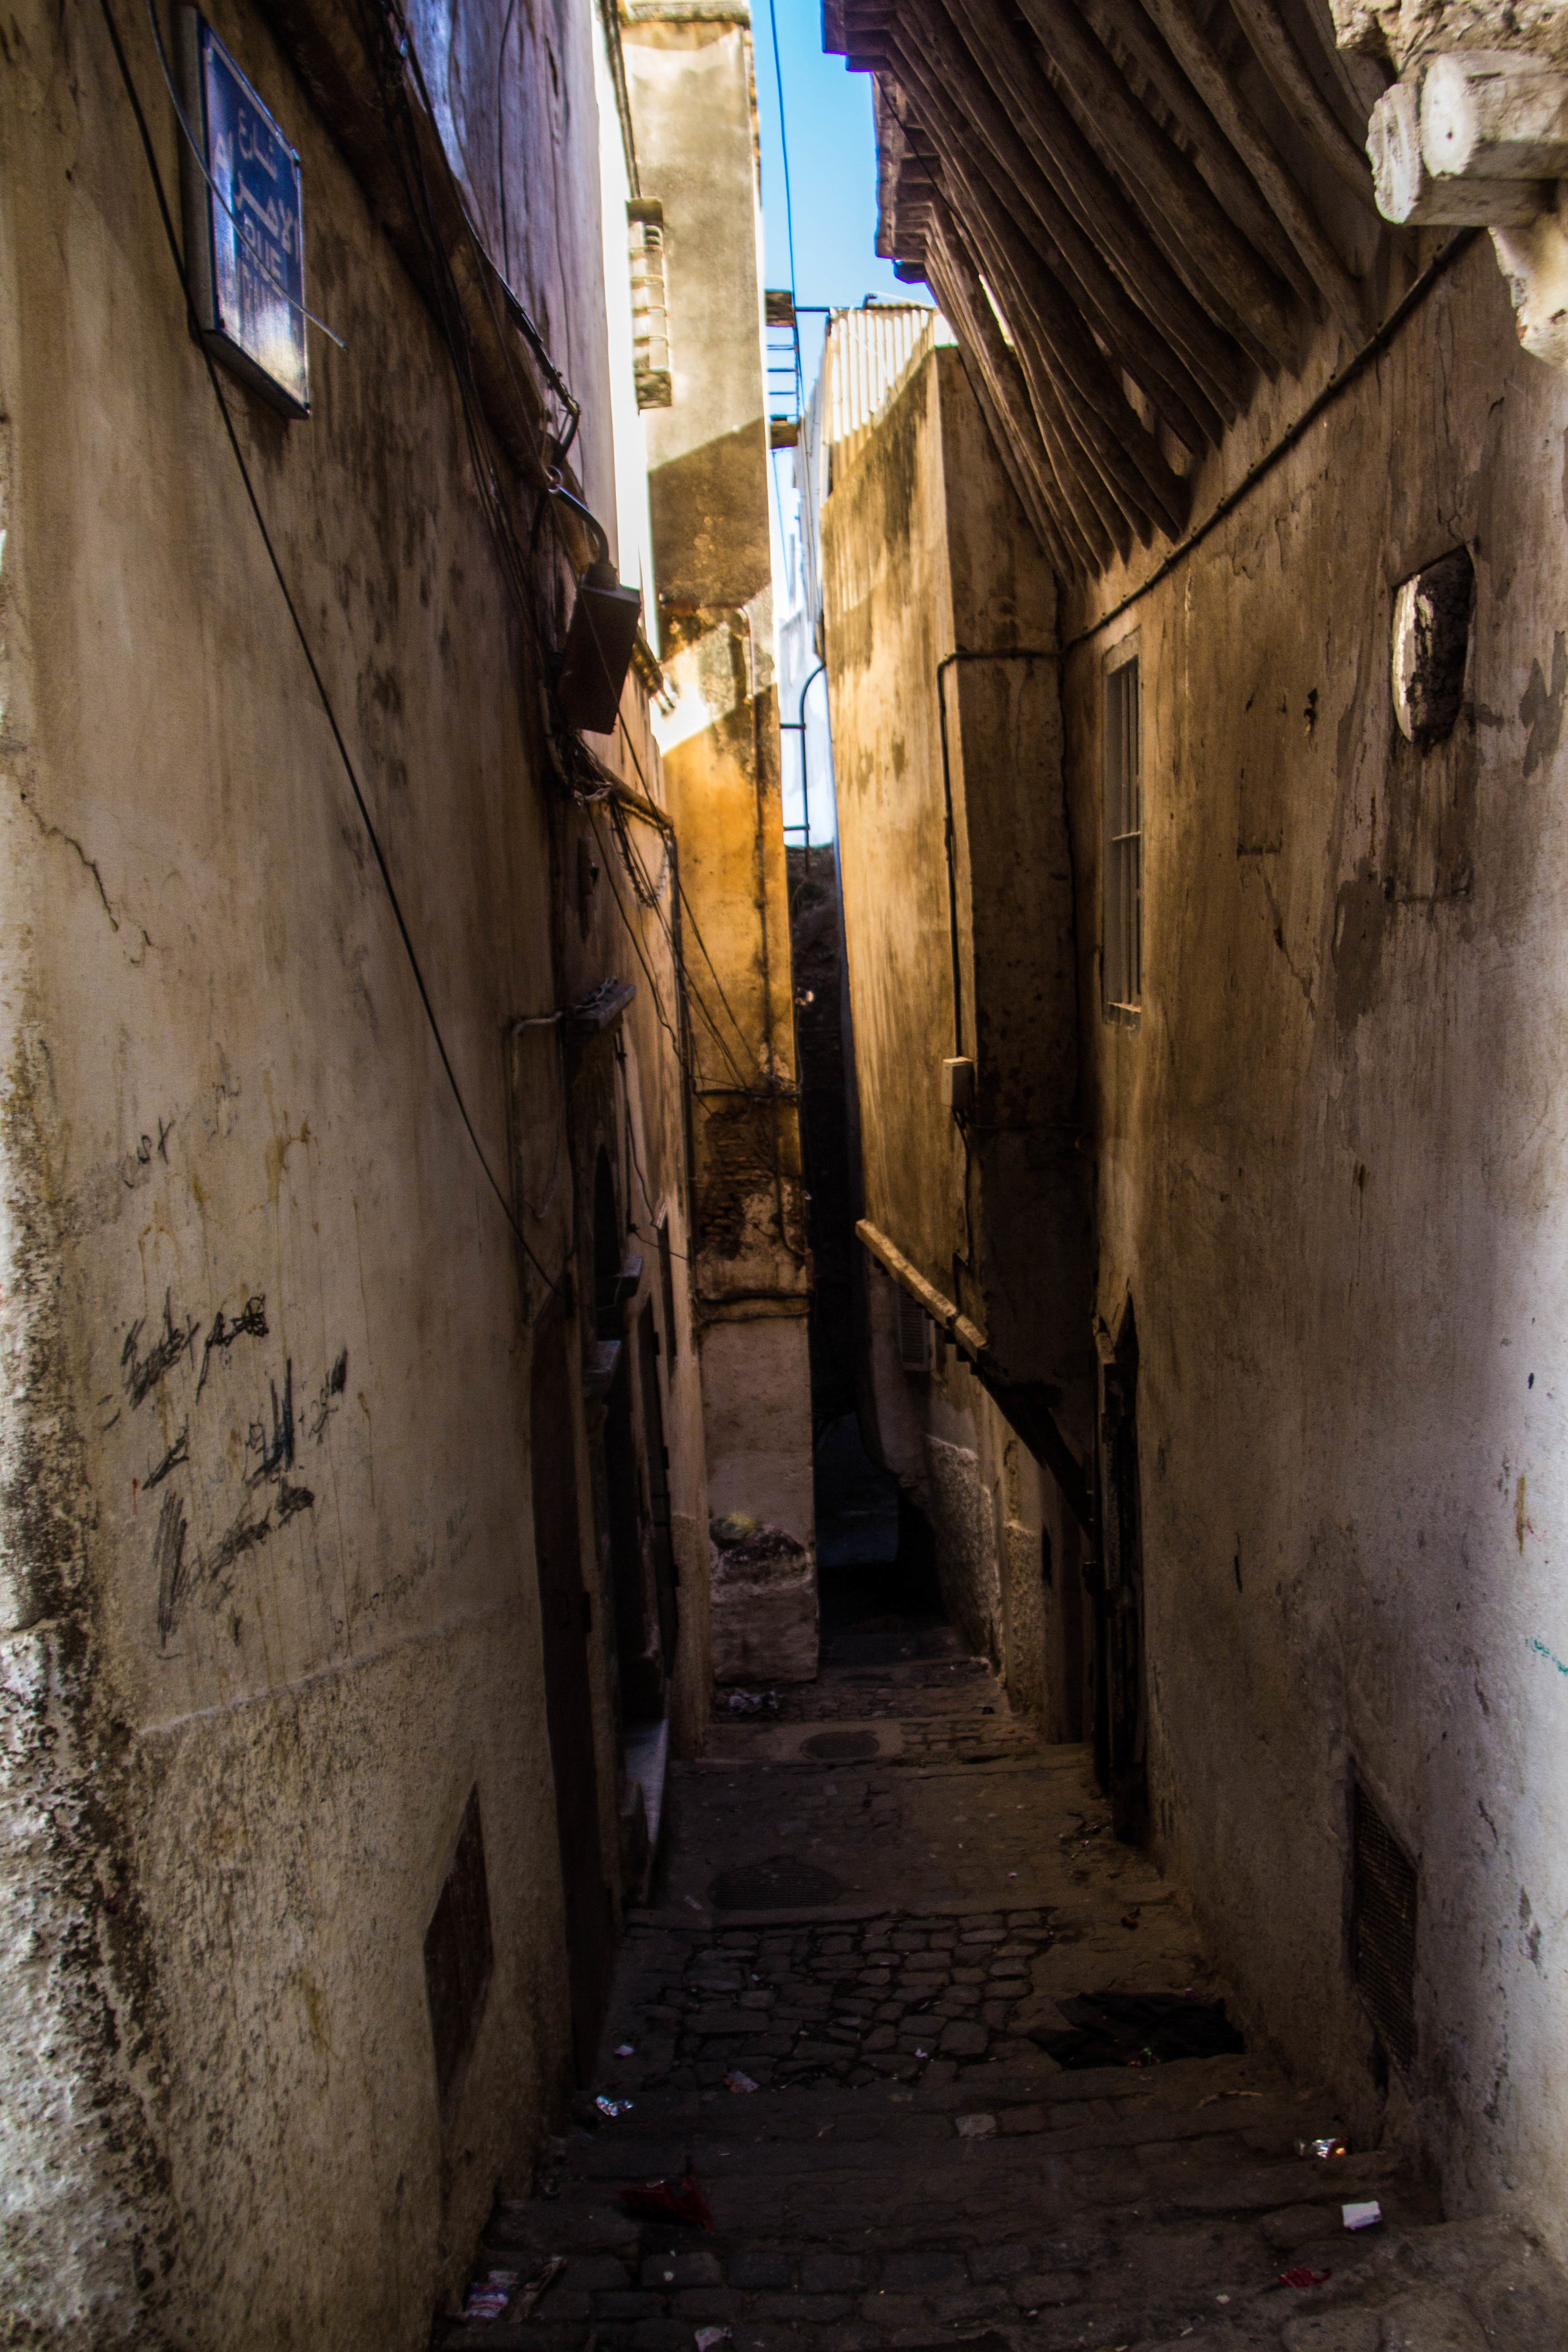 casbah-photography-algiers-algeria-alger-22.jpg